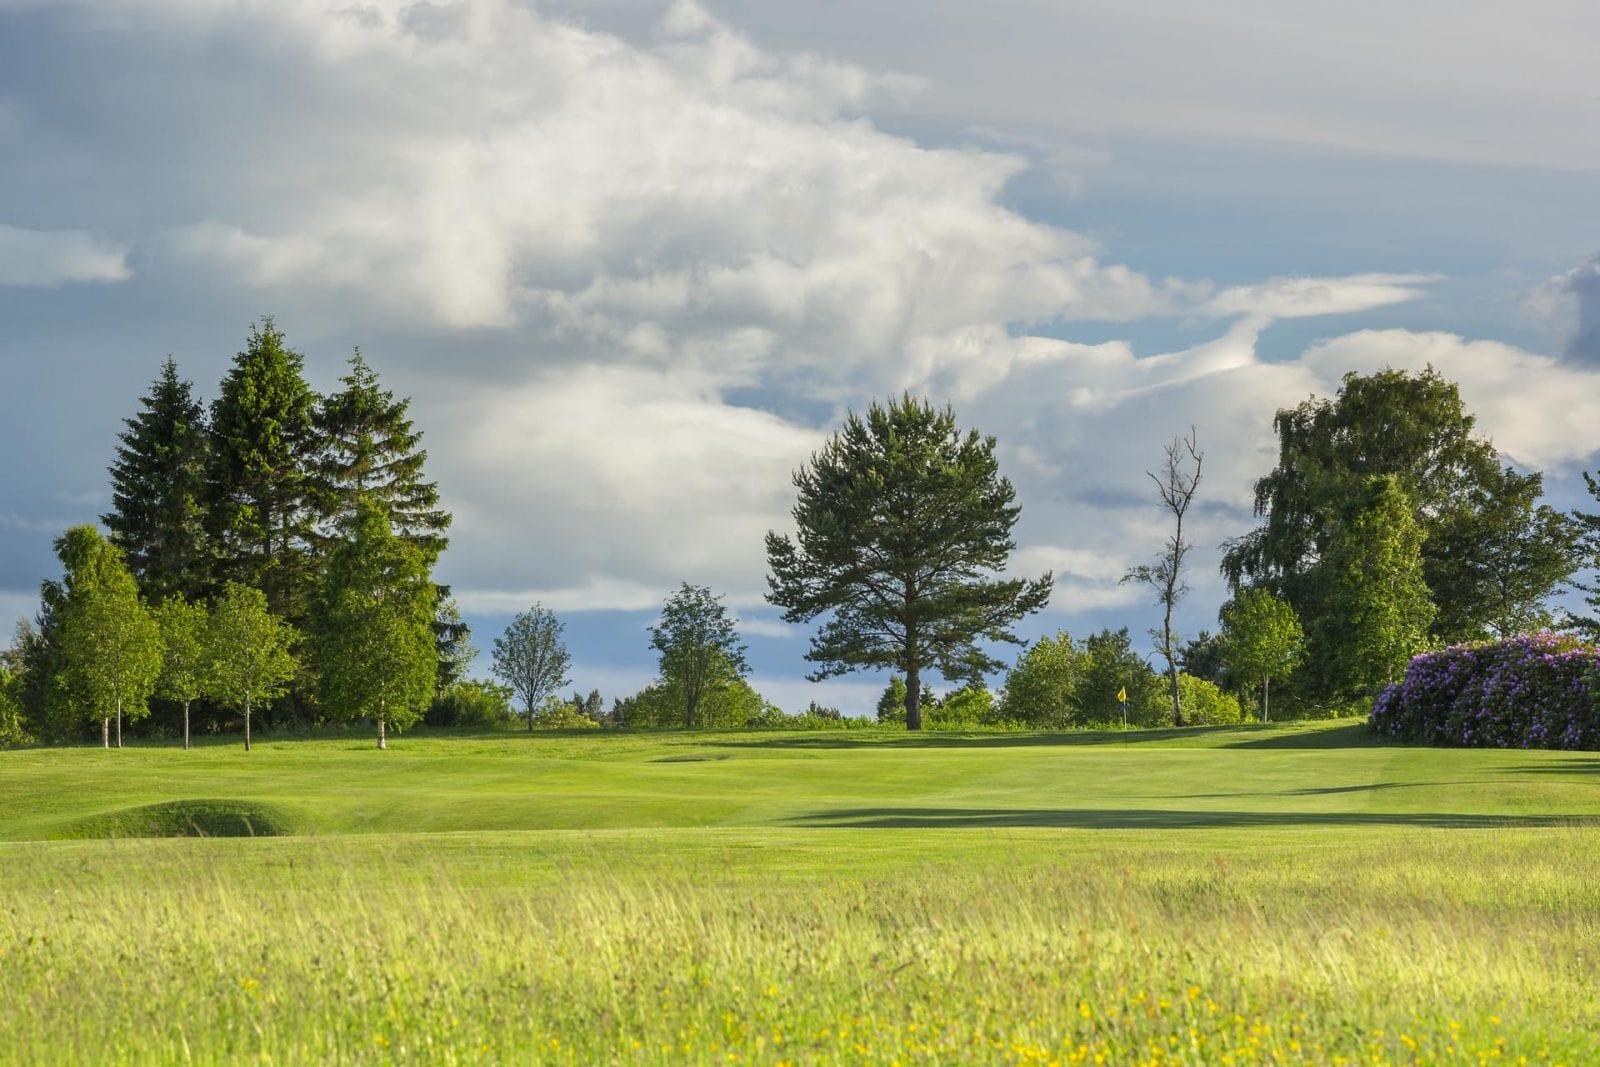 Edzell Golf Club flat trees